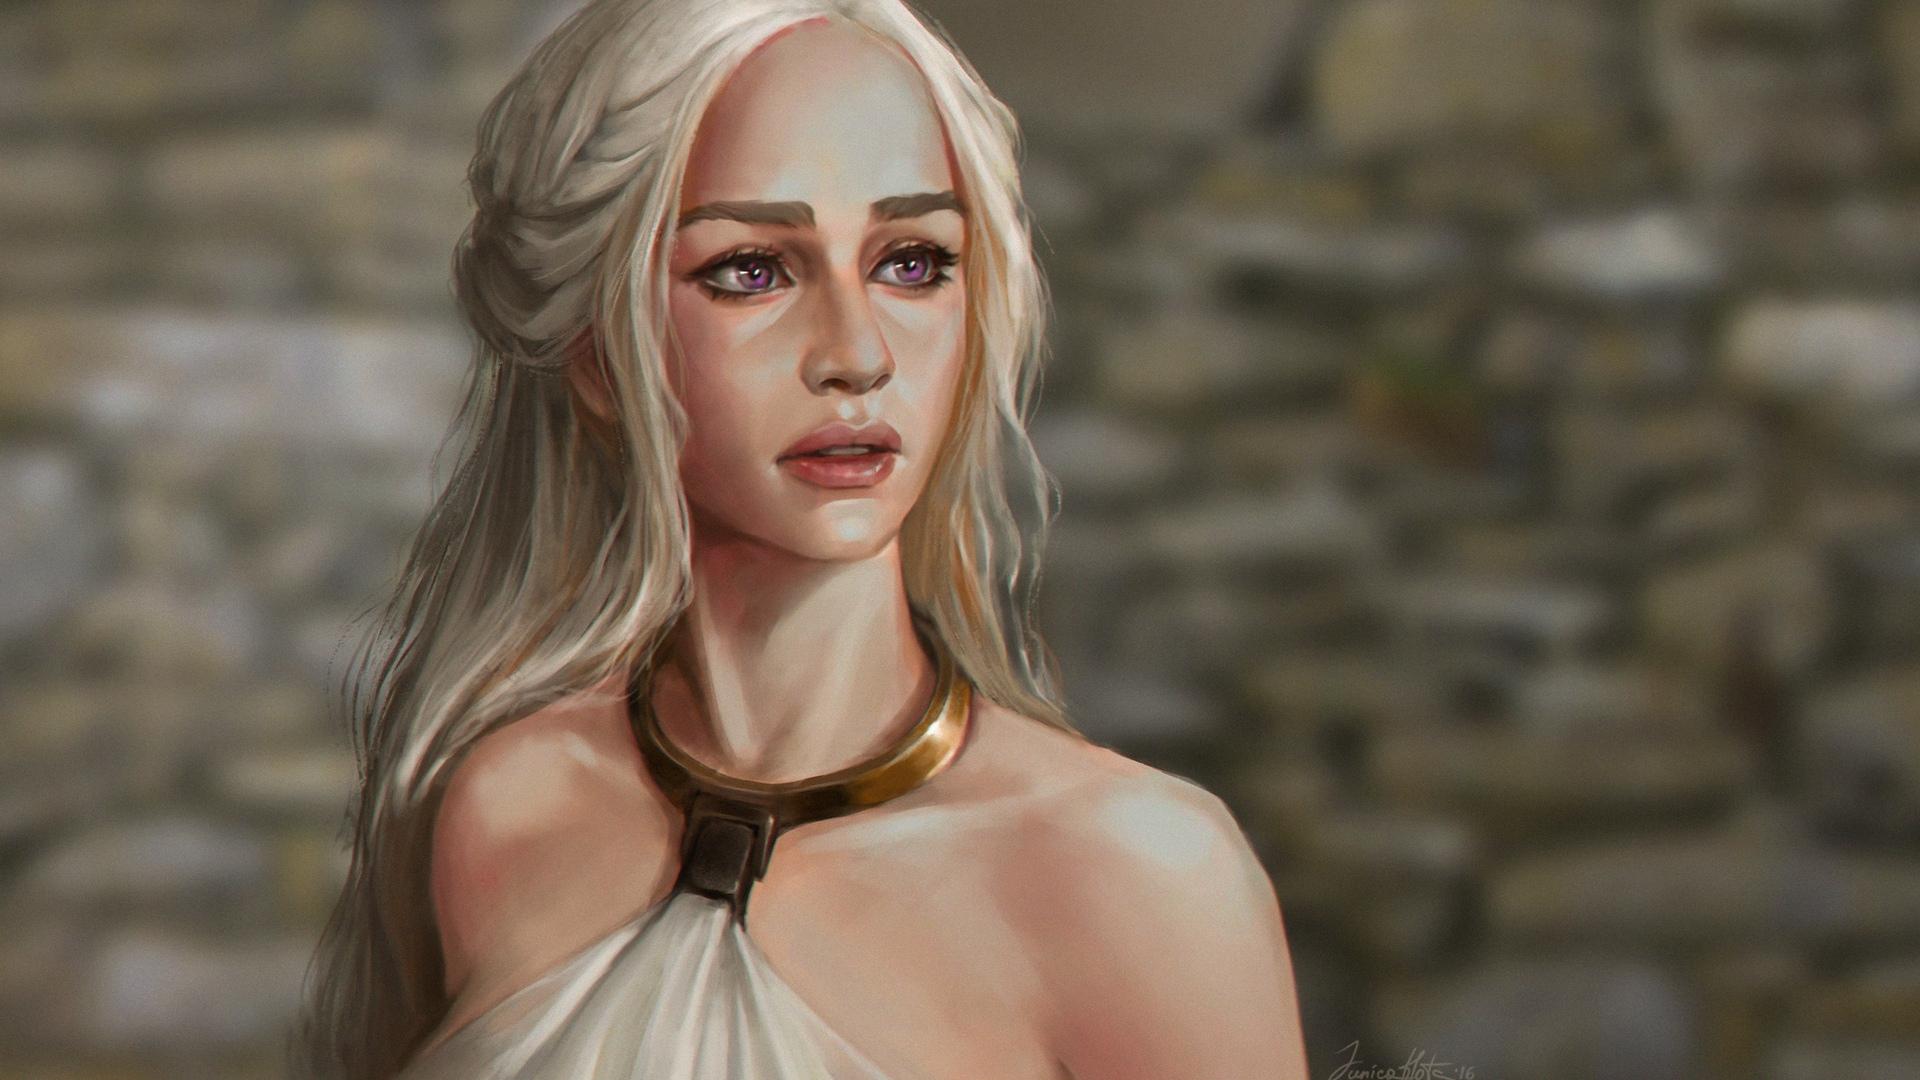 daenerys-targaryen-fanart-ya.jpg